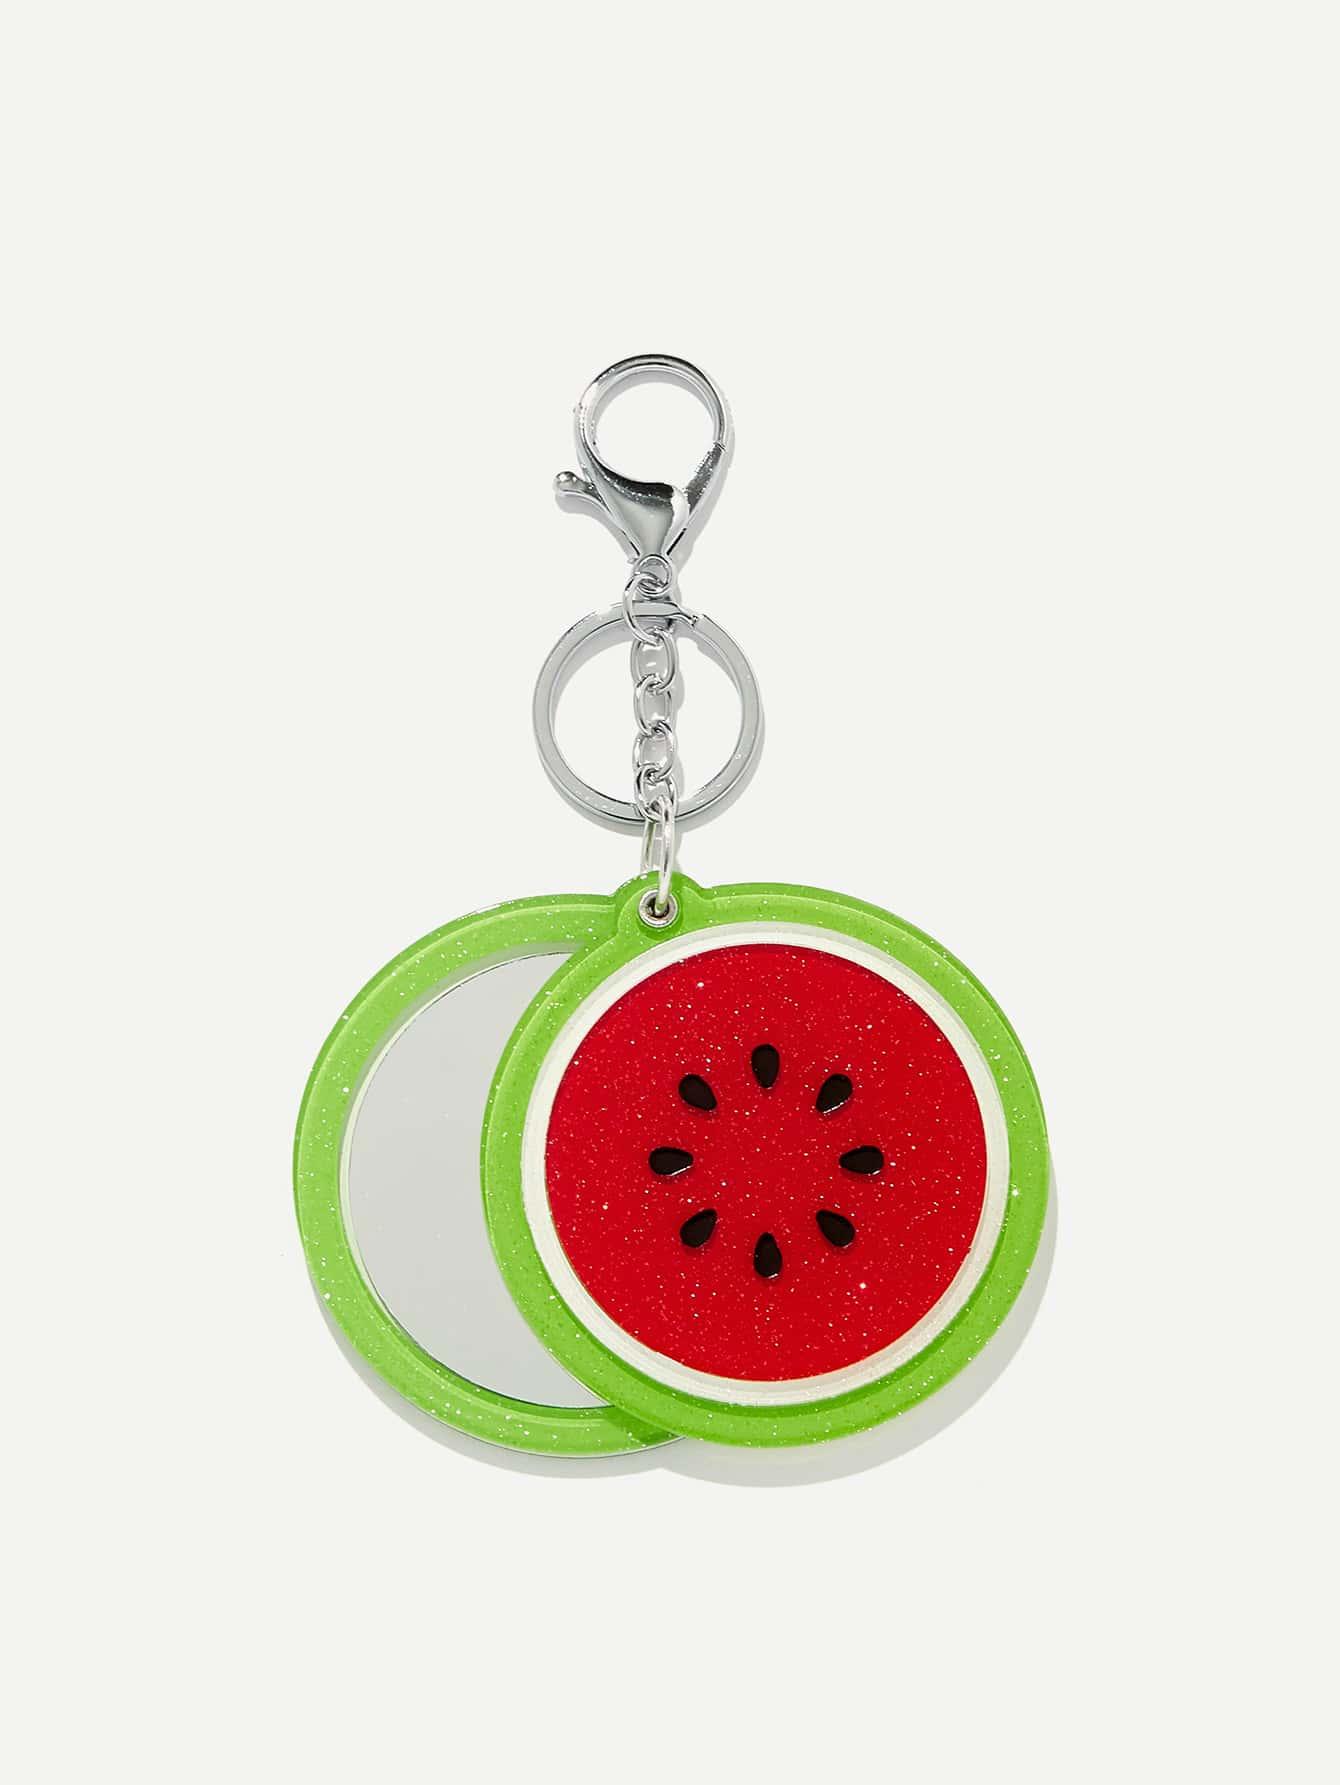 Watermelon Shaped Keychain